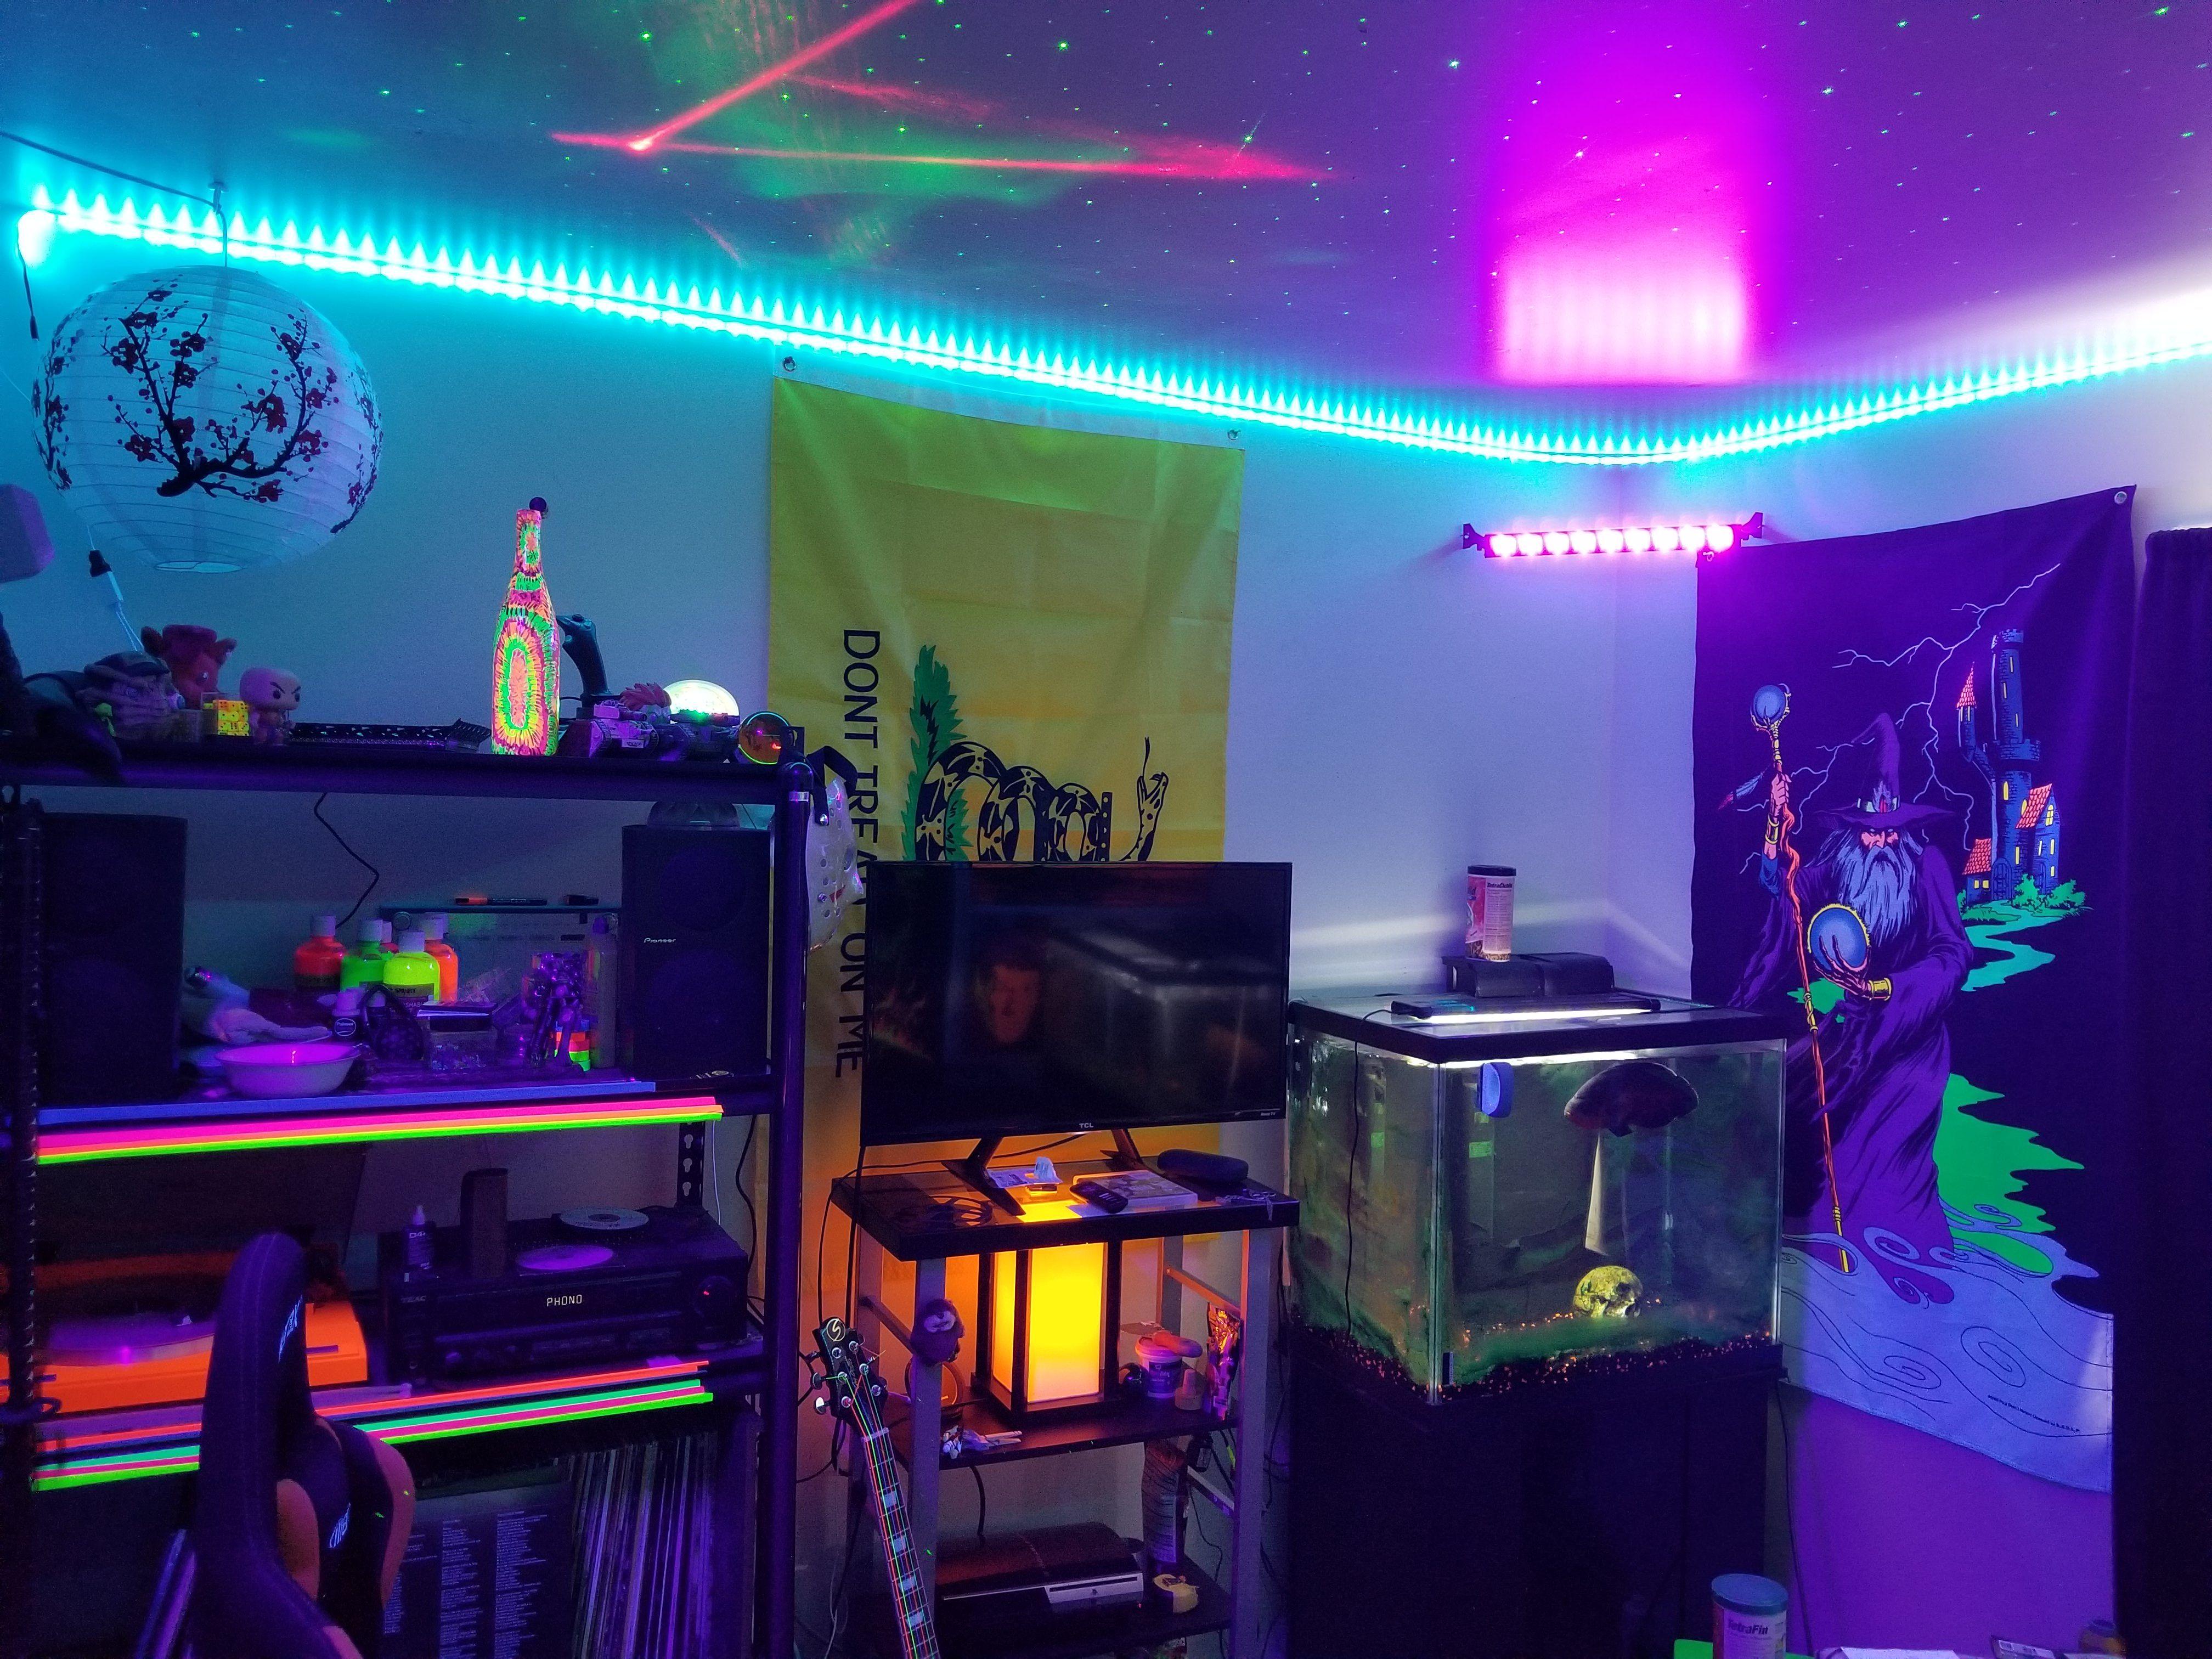 Led Strip Light Bedroom Ideas Google Search Led Strip Lights Bedroom Neon Bedroom Led Lighting Bedroom